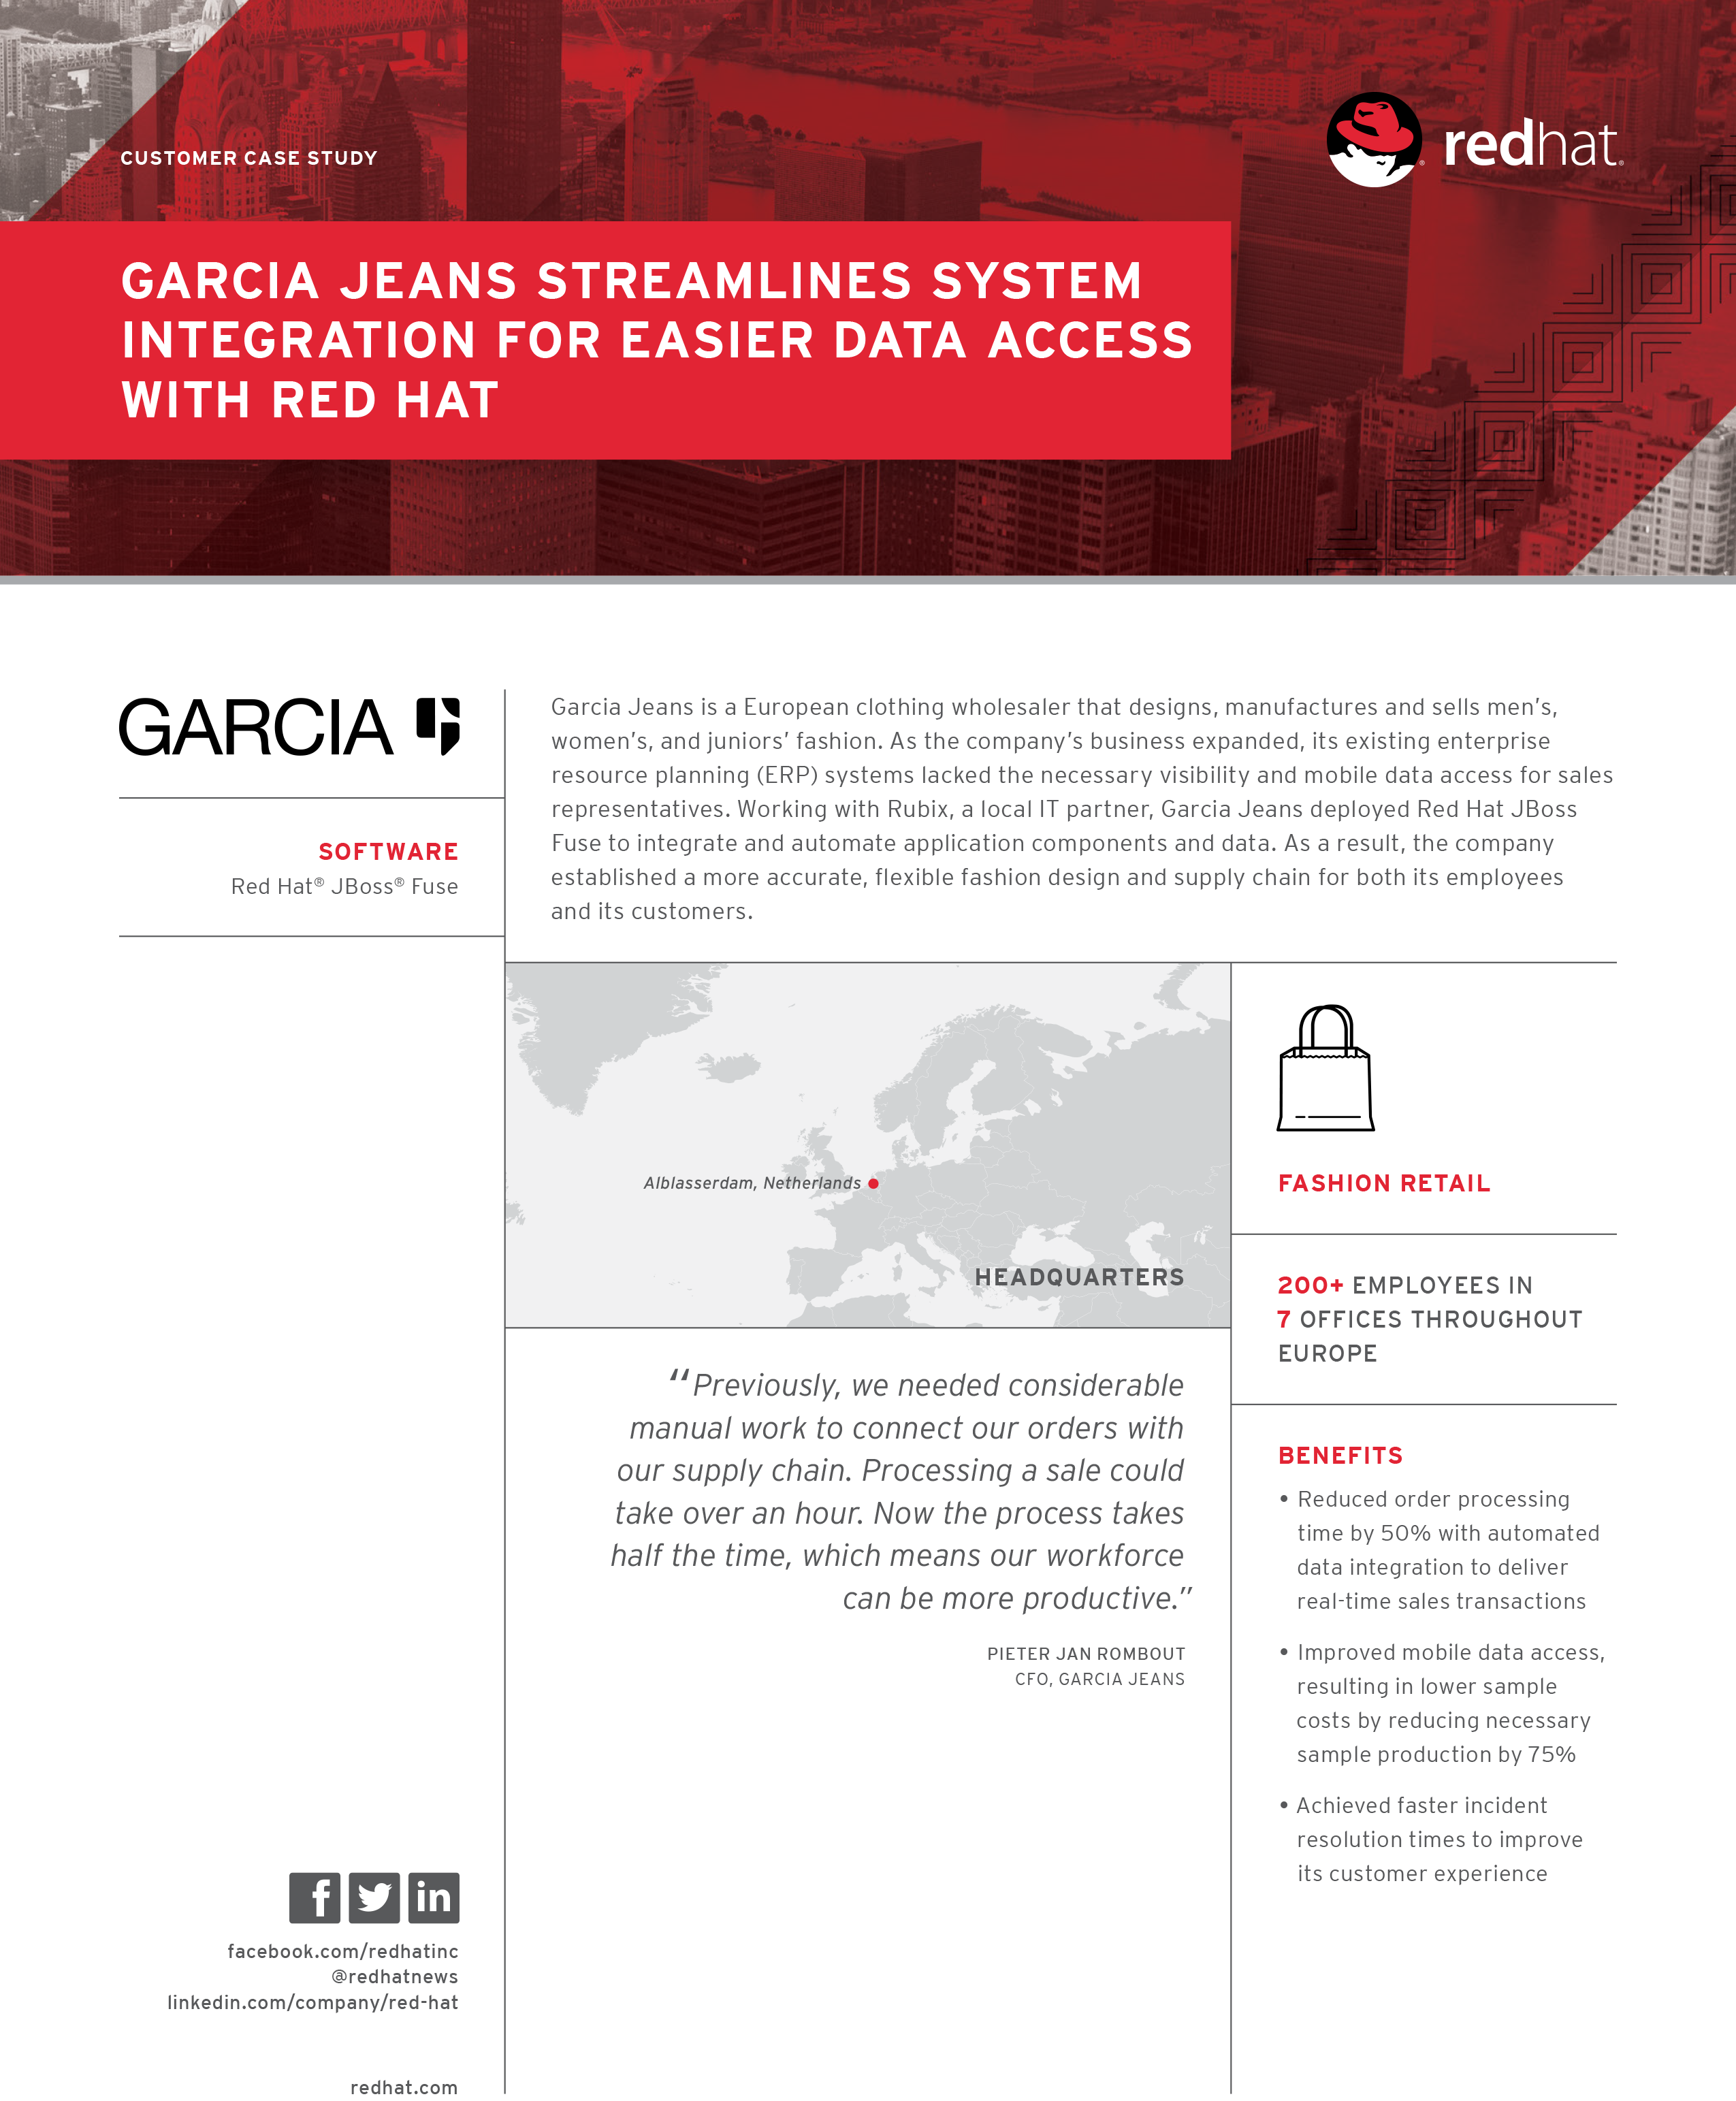 rh-garcia-jeans-automates-integrates-application-systems-sales-data-retail-jboss-fuse-case-study-f8157kc-201712-en-1